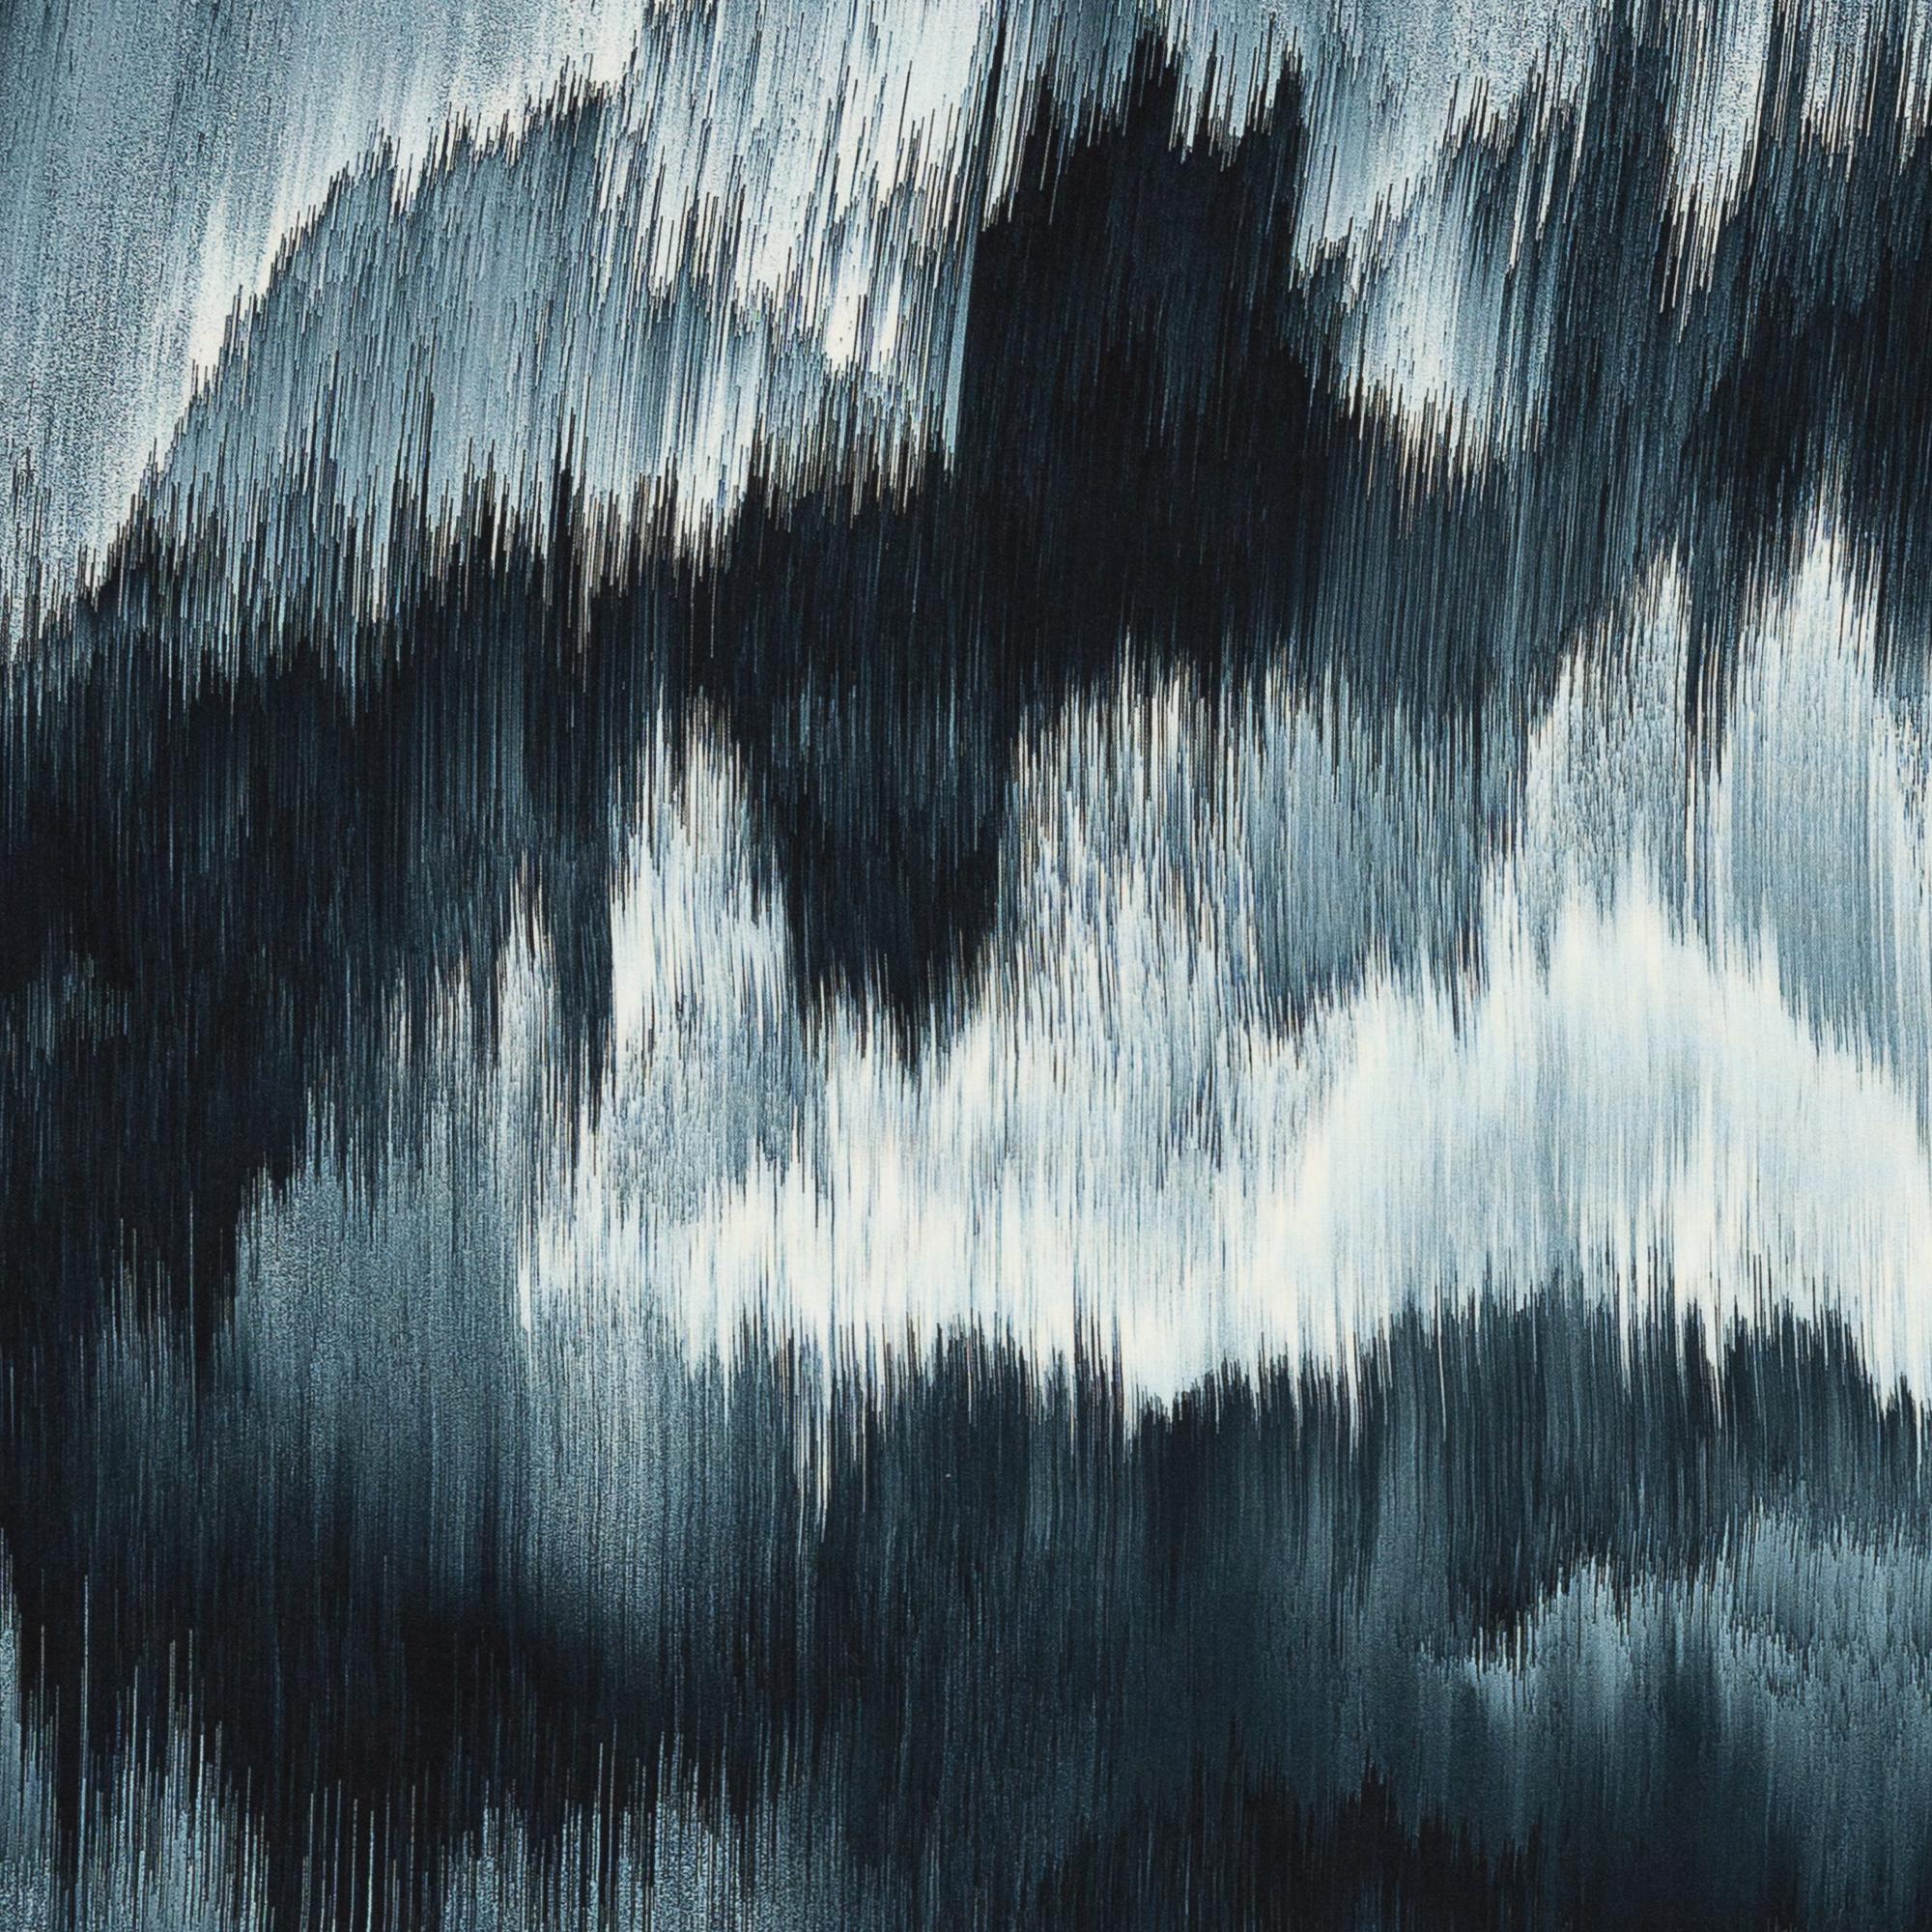 Viskose - Viskosewebware - Swafing - Dripstones by Thorsten Berger - Muster in Petroltönen